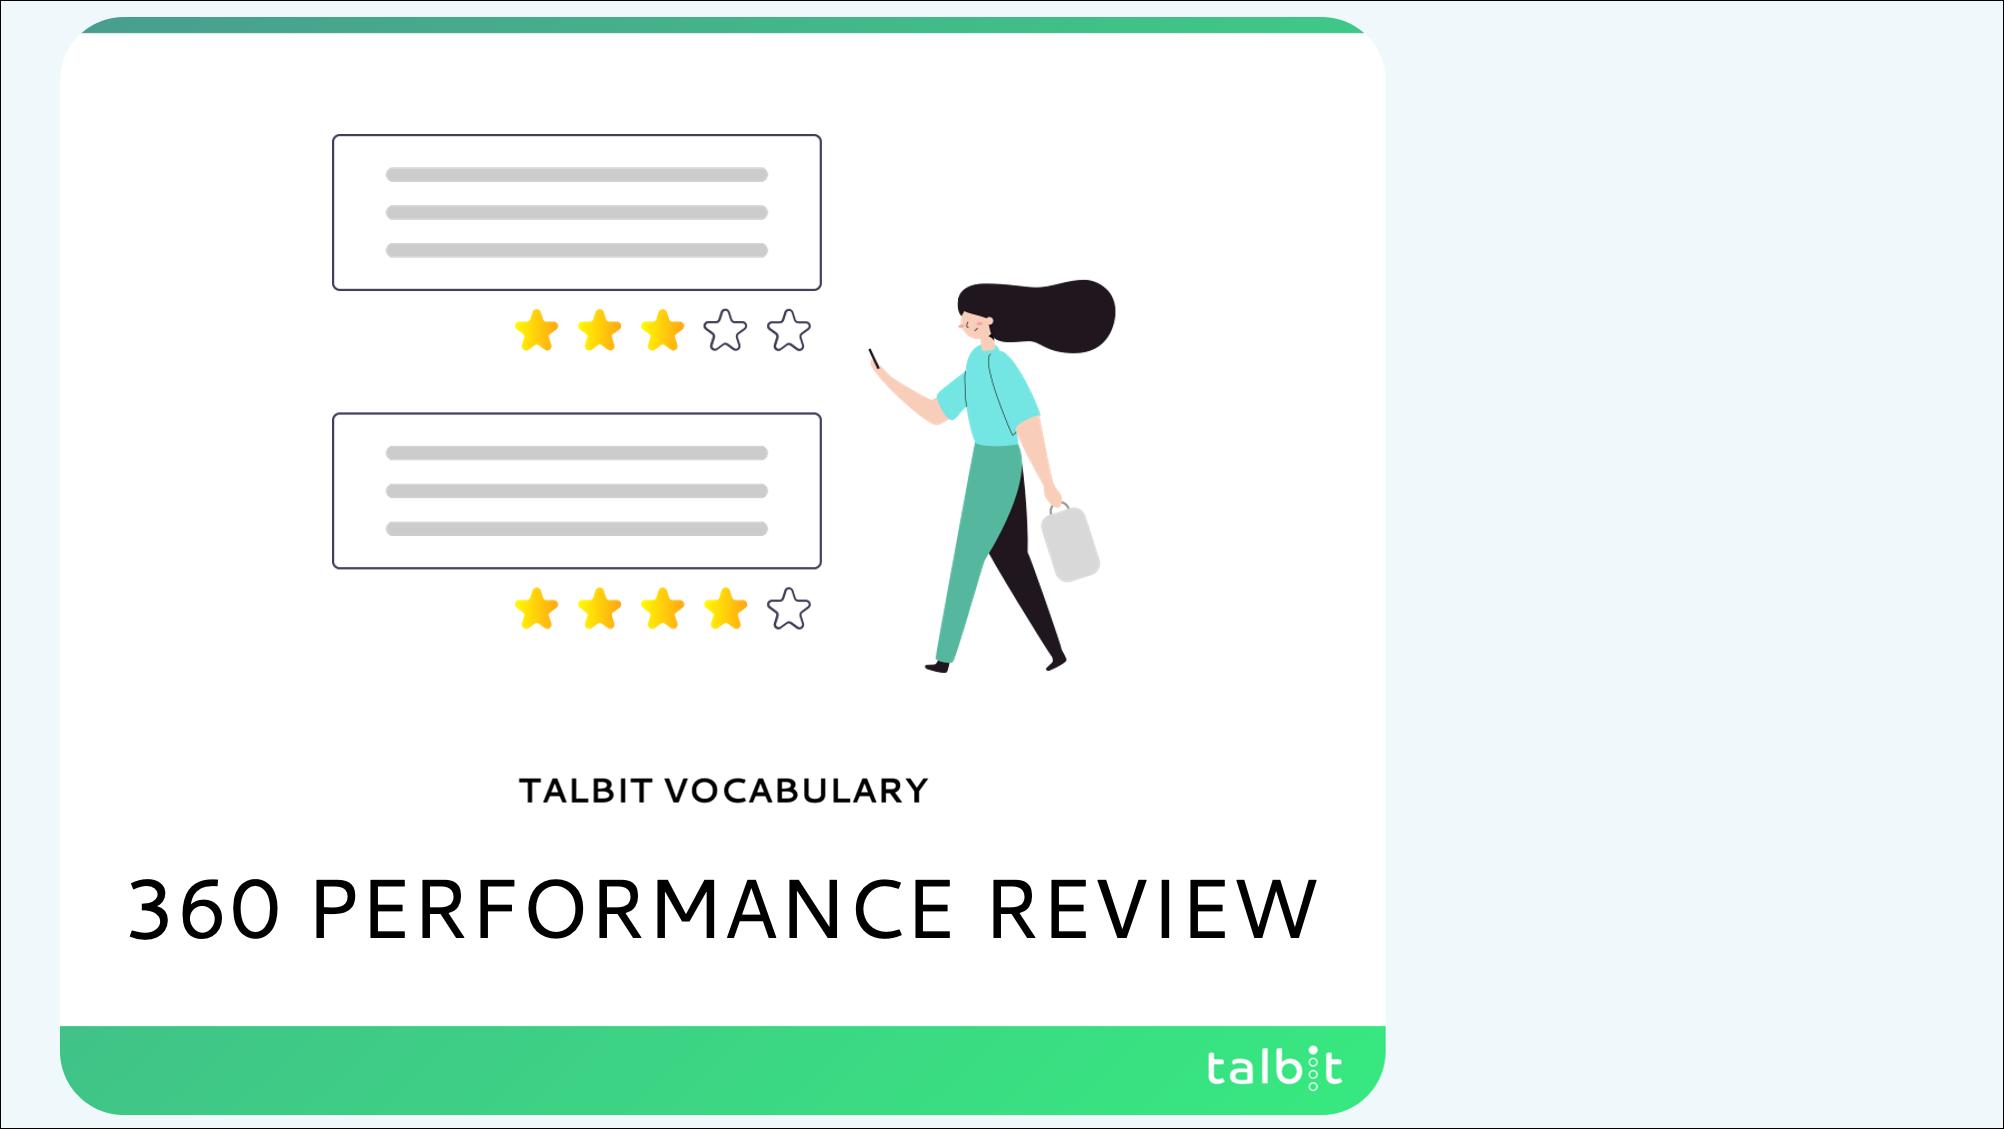 Vocabulary: 360 Performance Review